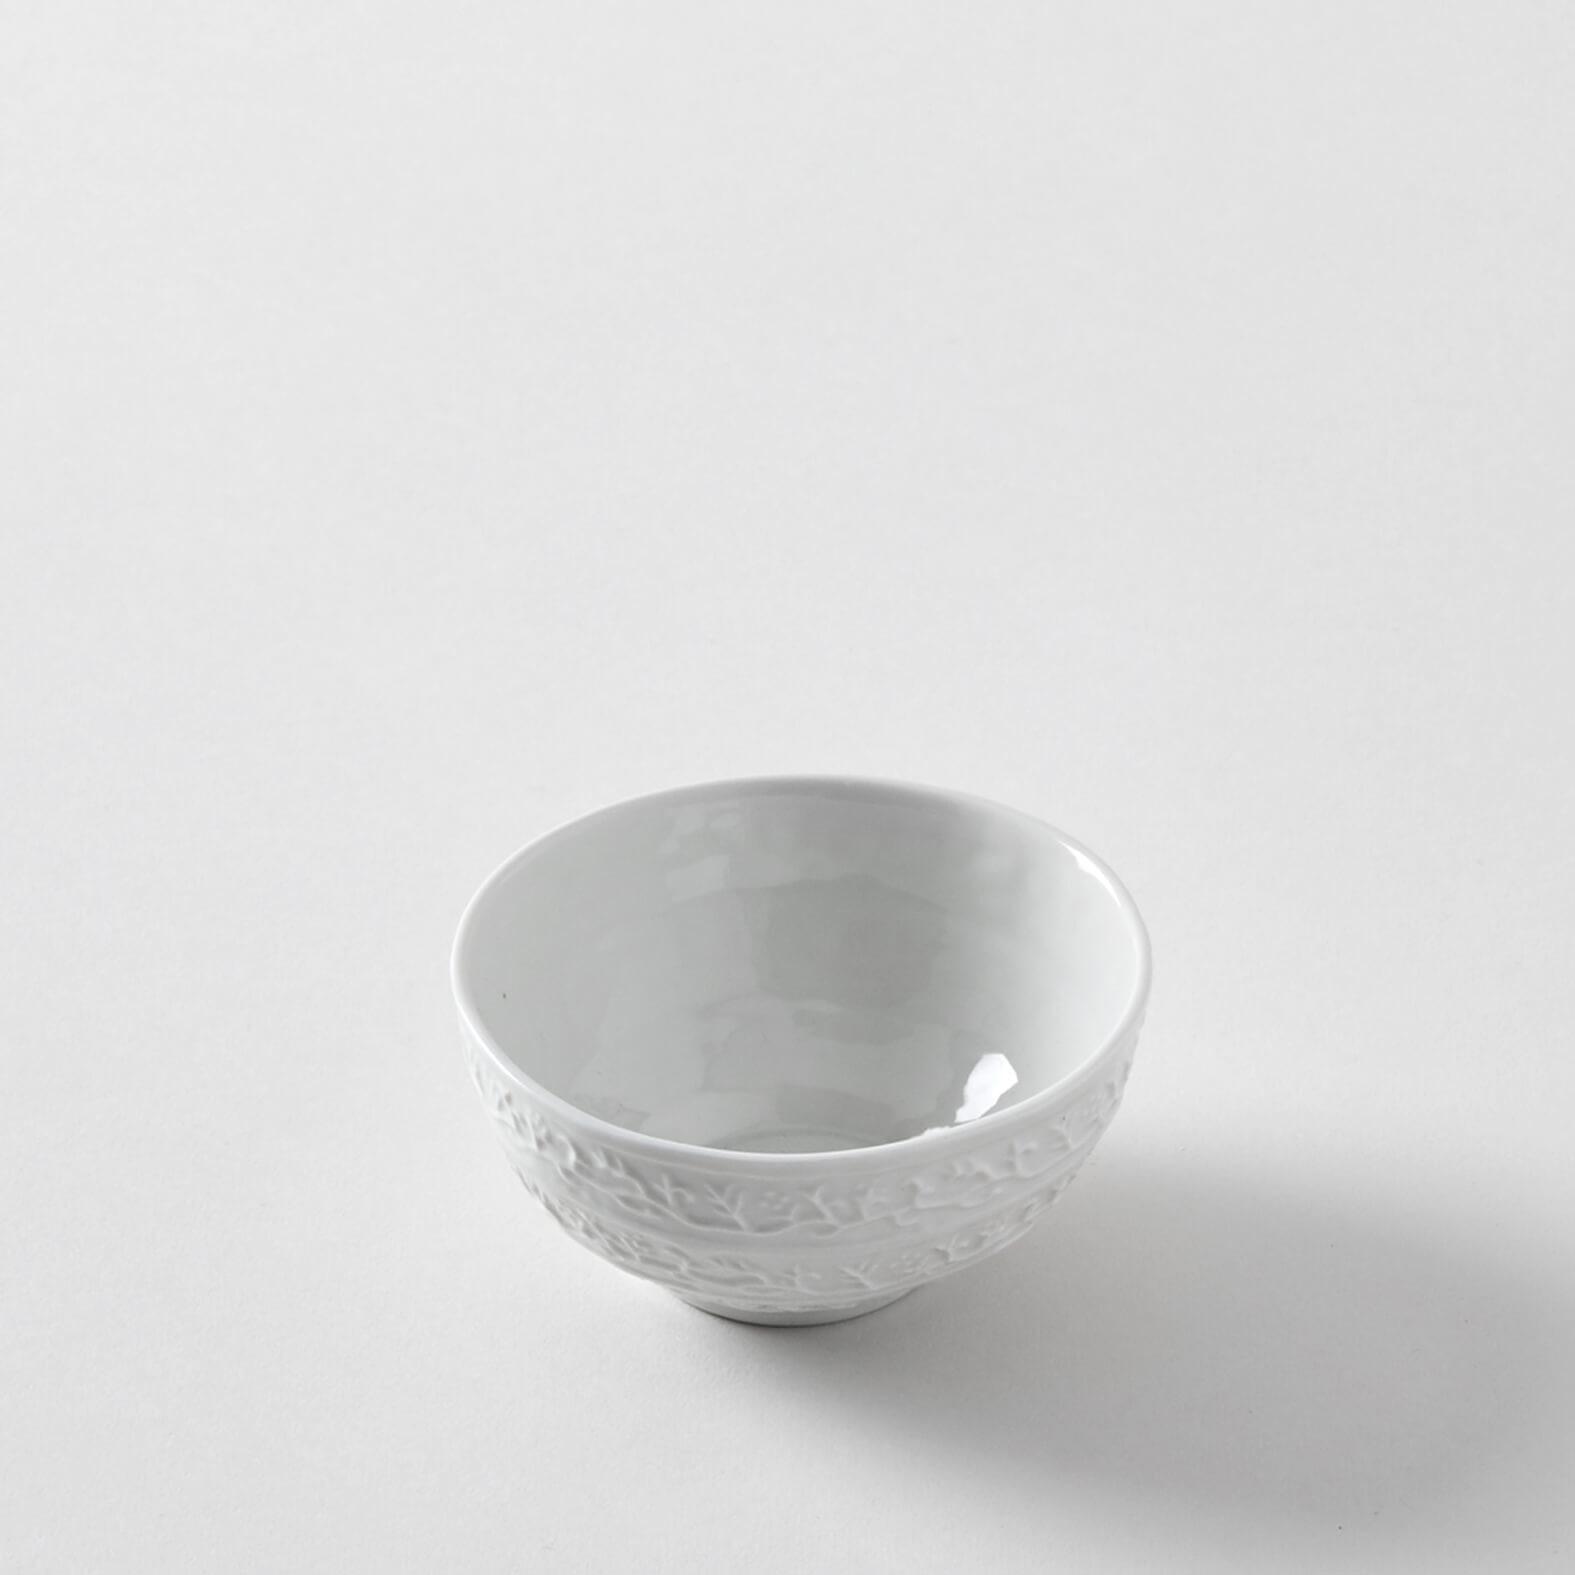 alix d reynis arabie bowl bodhi tree. Black Bedroom Furniture Sets. Home Design Ideas